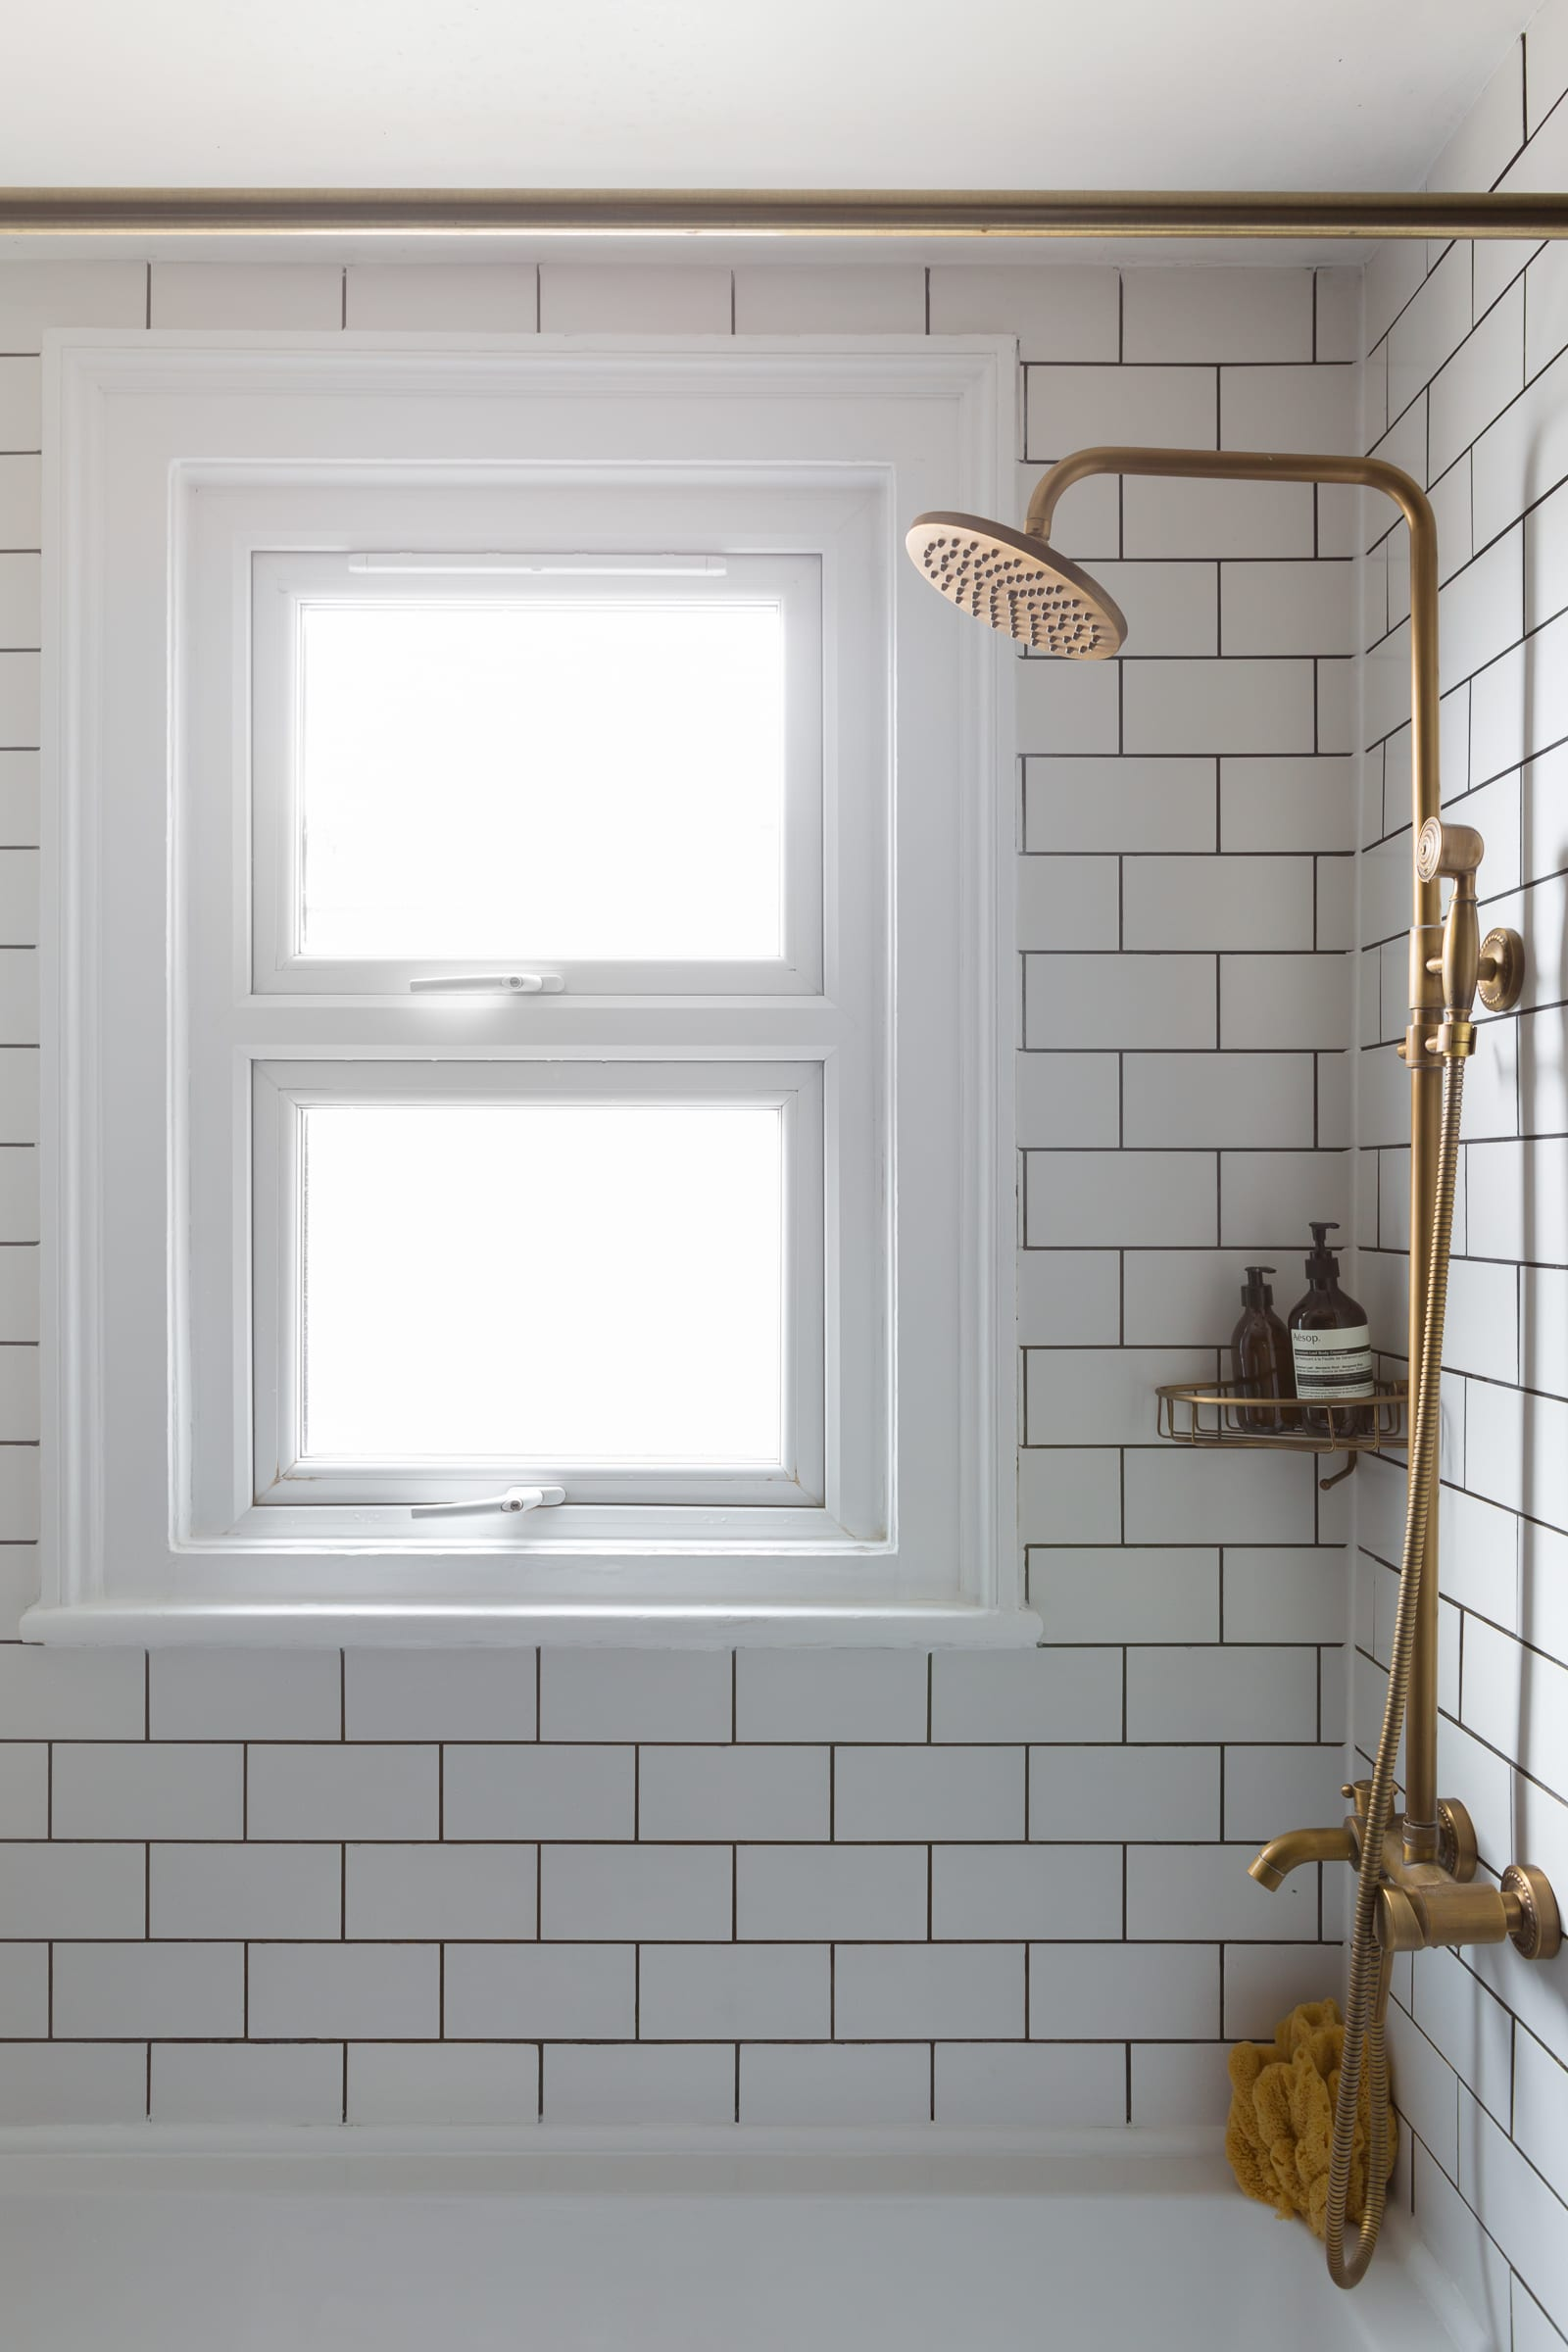 Subway Tile Bathrooms   Bathroom Tile Ideas Floor Shower Wall Designs